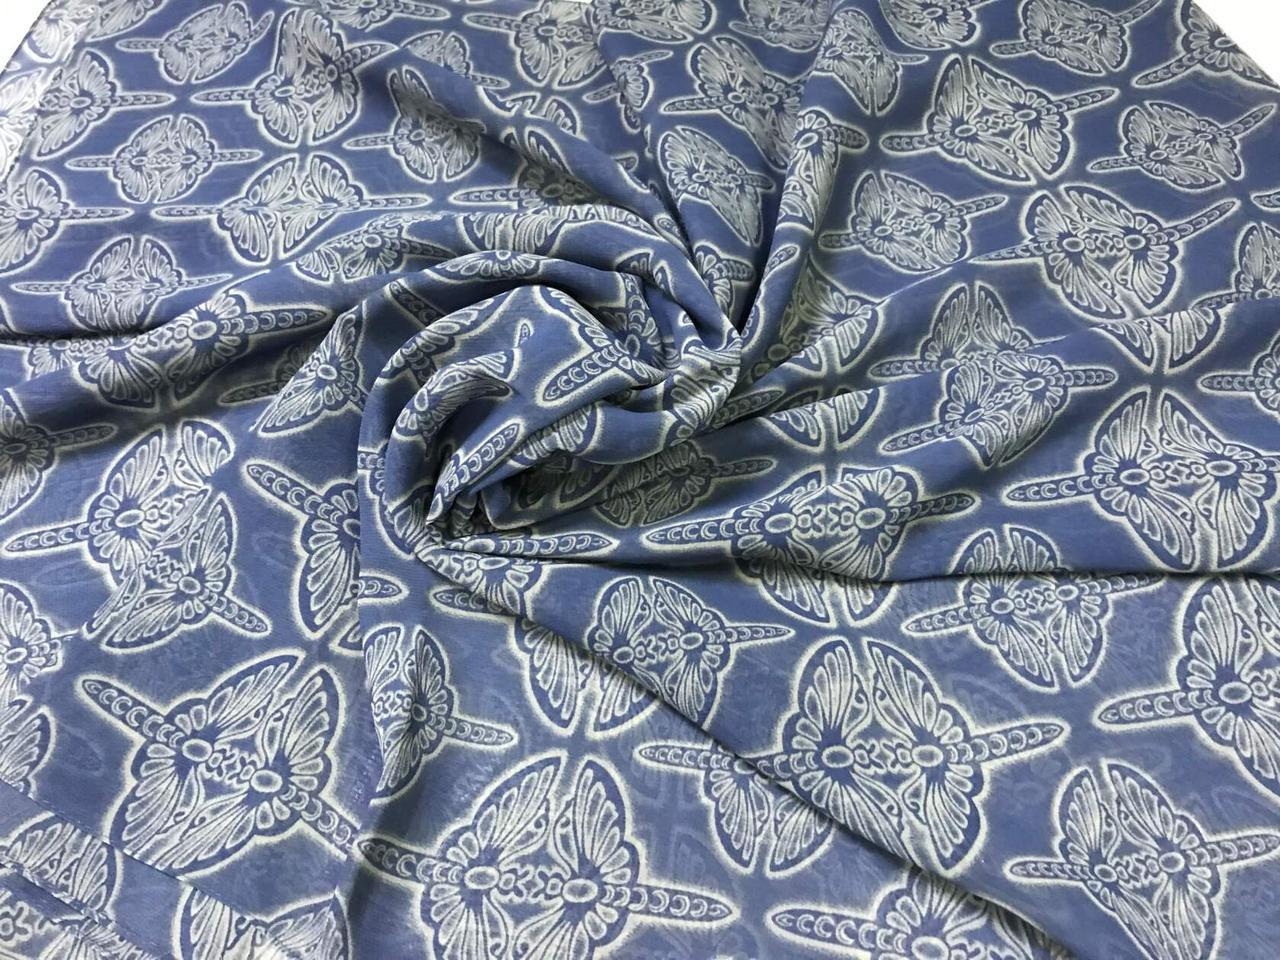 Синий женский шарф-палантин шифон  174х75 см  с рисунком